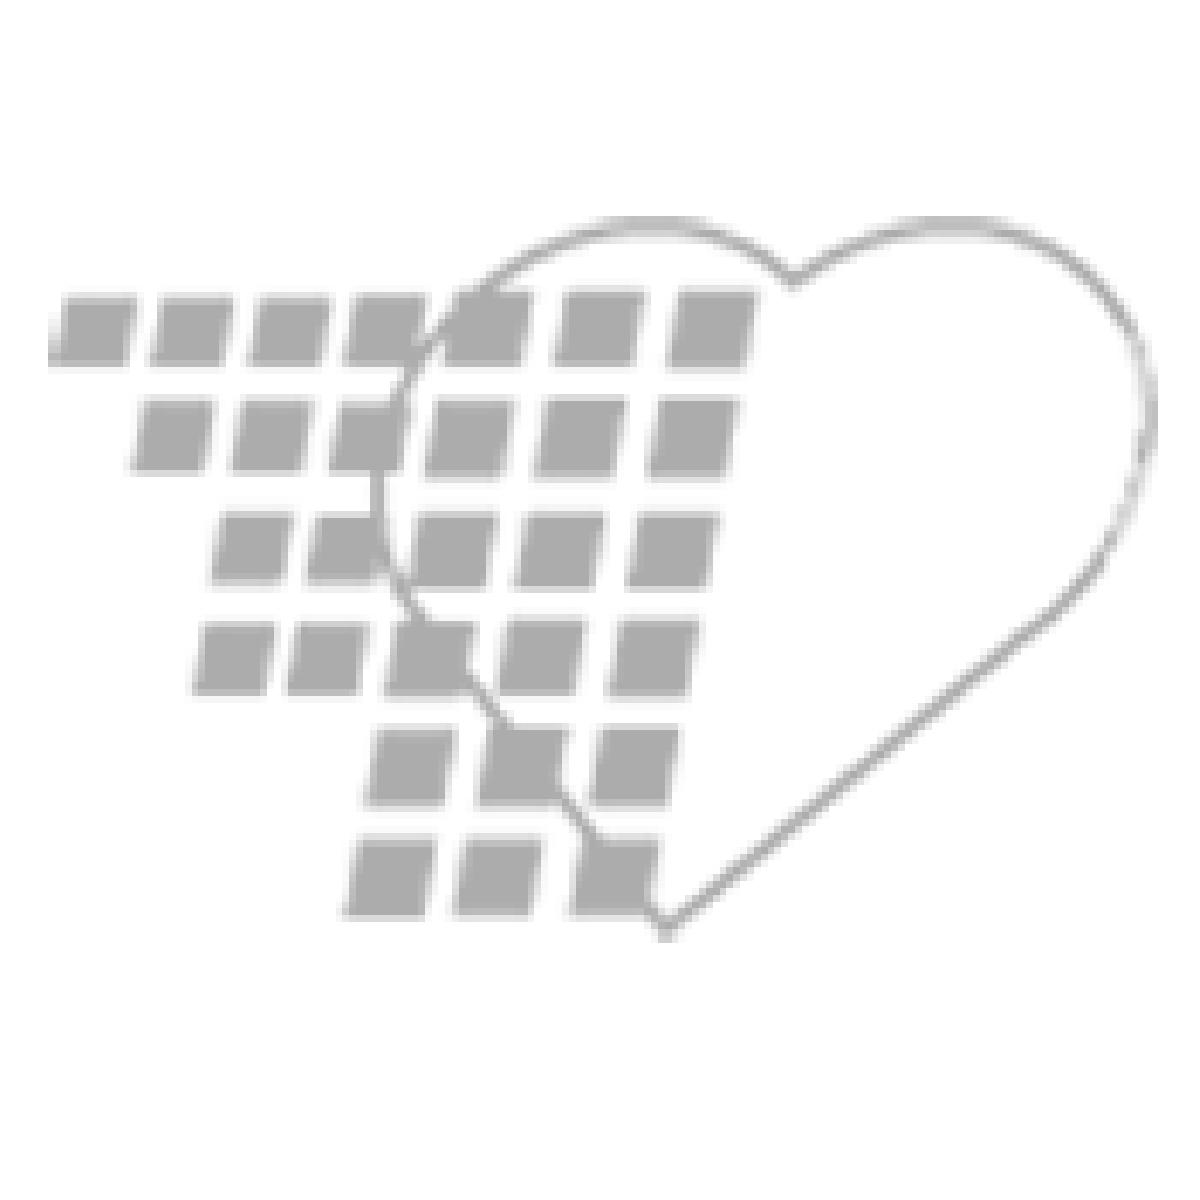 02-80-1111 Pocket Nurse® Locking Stethoscope I.D. Tag